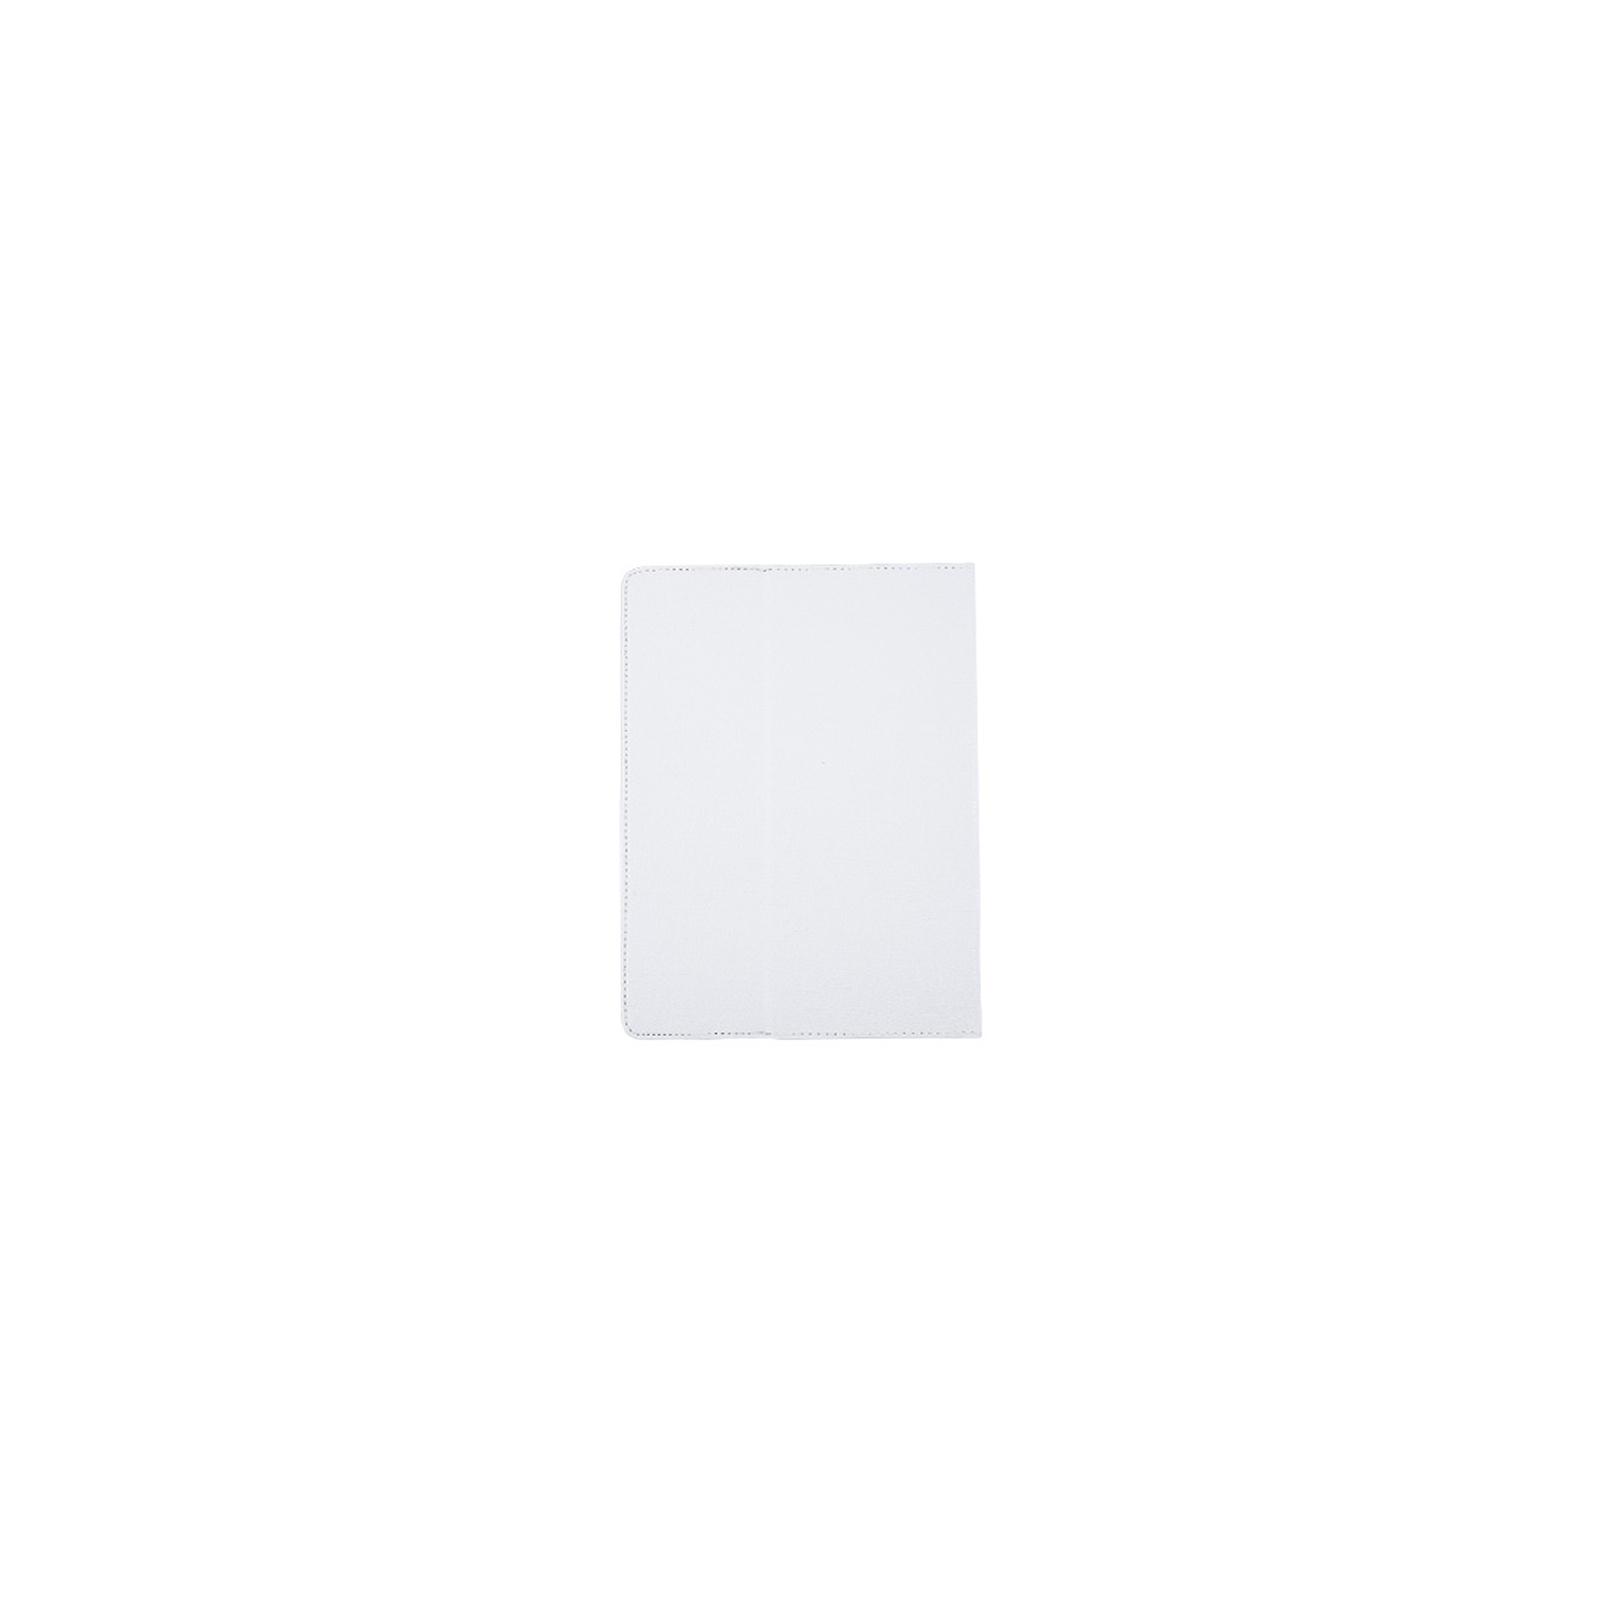 "Чехол для планшета Drobak 10""-10.1"" Universal Stand White (216882) изображение 2"